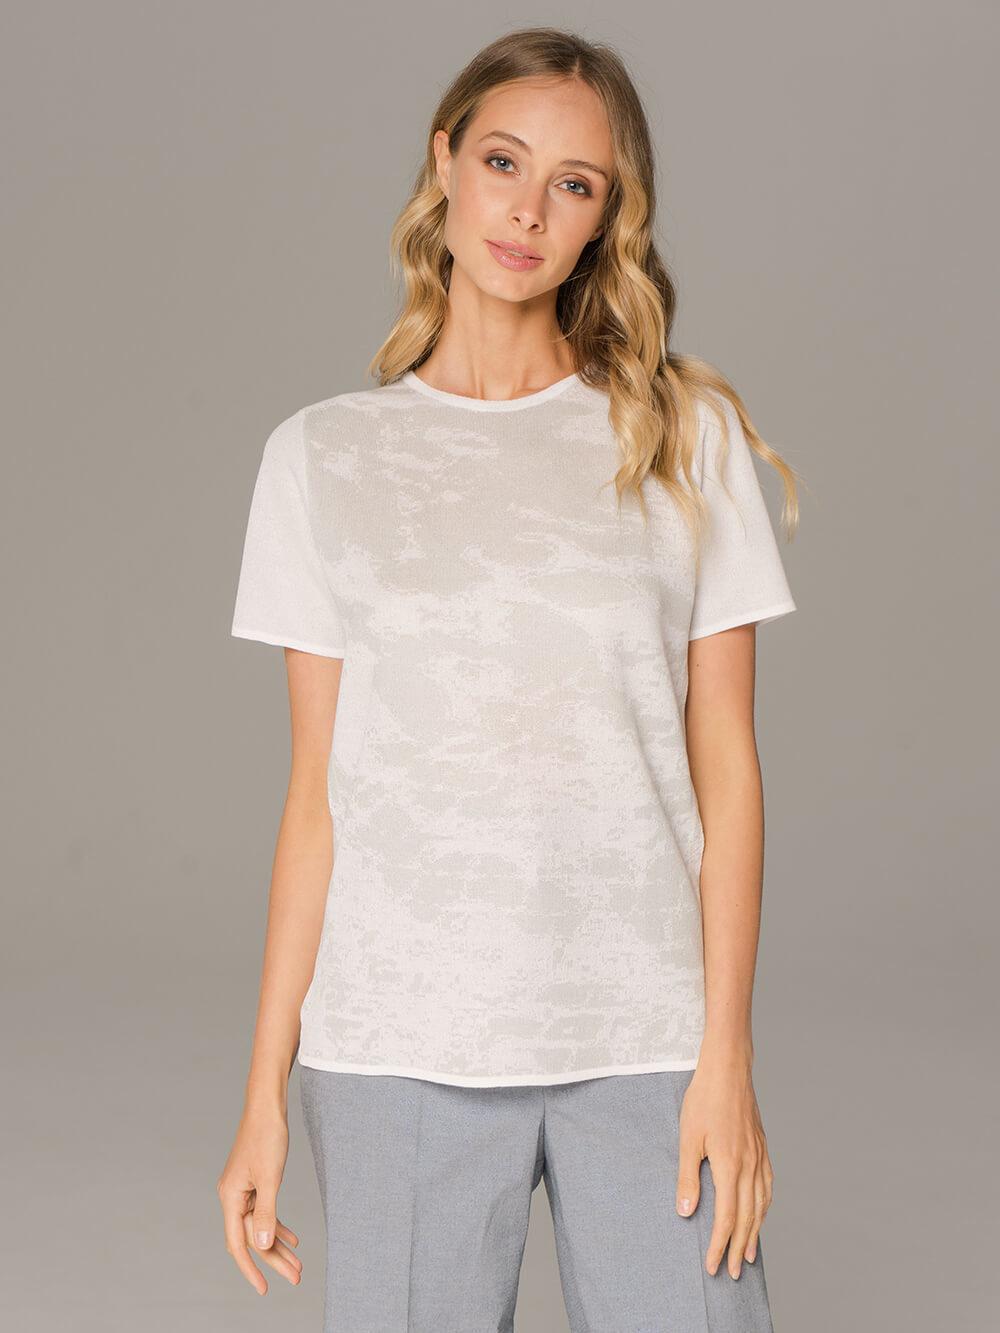 Женский джемпер с коротким рукавом белого цвета - фото 1